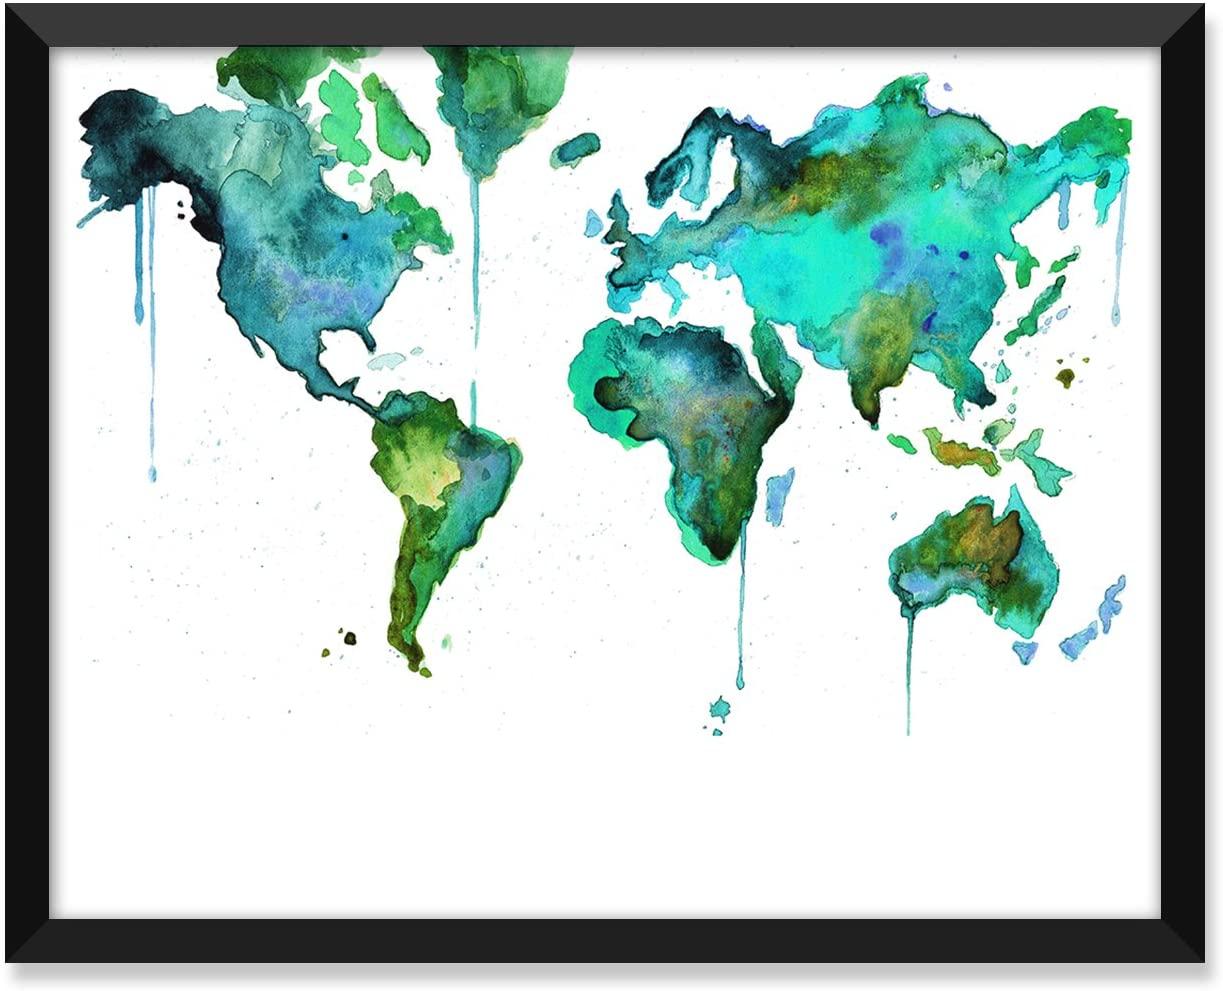 Serif Design Studios World Map Blue Green Watercolor, Travel Poster, Minimalist Poster, Home Decor, College Dorm Room Decorations, Wall Art